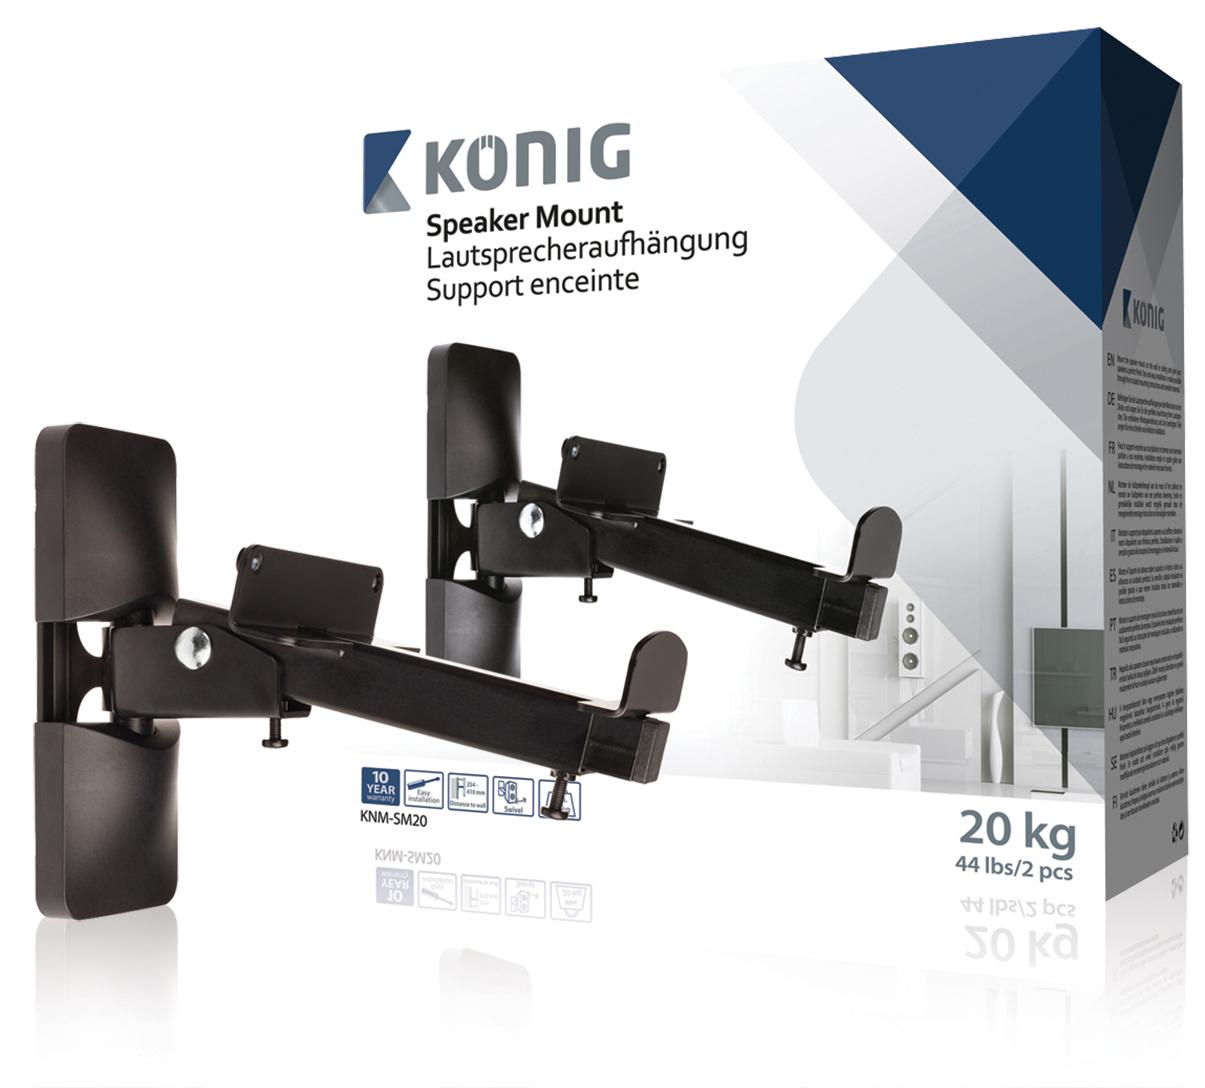 König KNM-SM20 - Držák reproduktoru, nosnost 20 kg, 2 ks